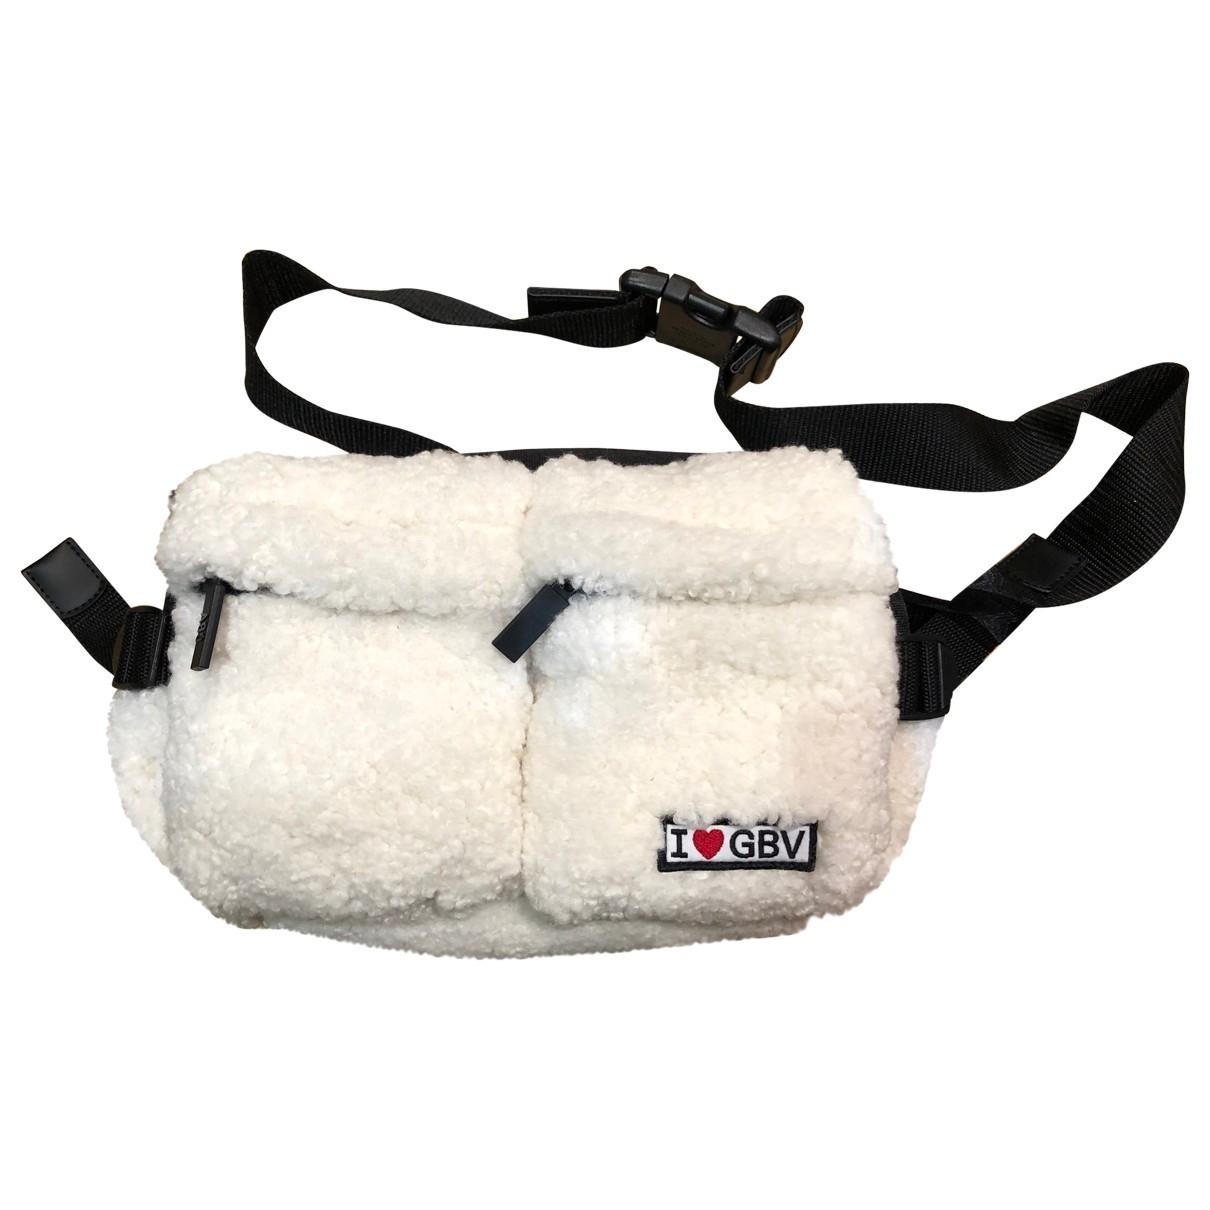 Giambattista Valli X H&m \N Beige Cloth bag for Men \N